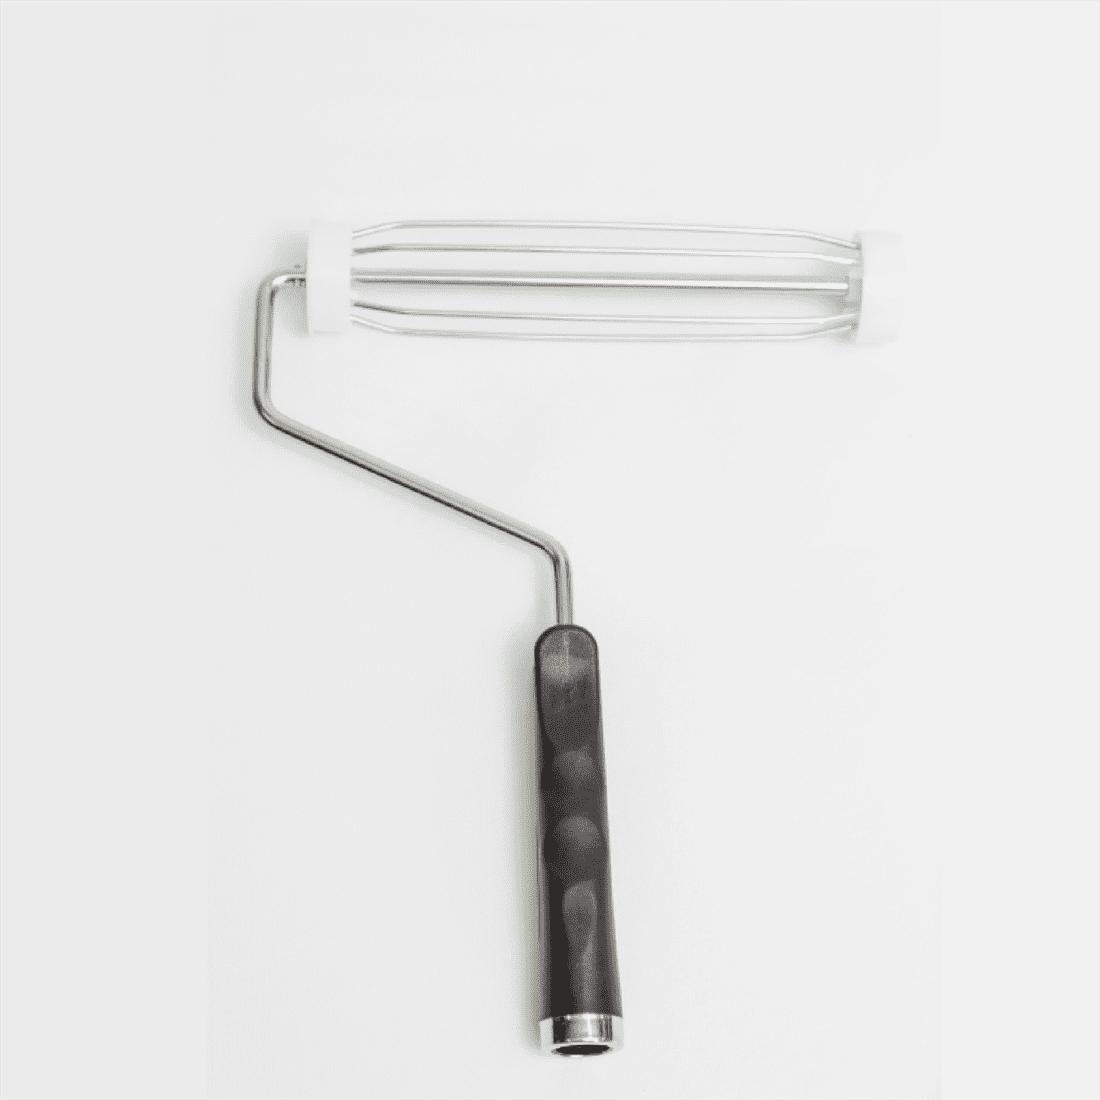 Roller Frame Screw-fix